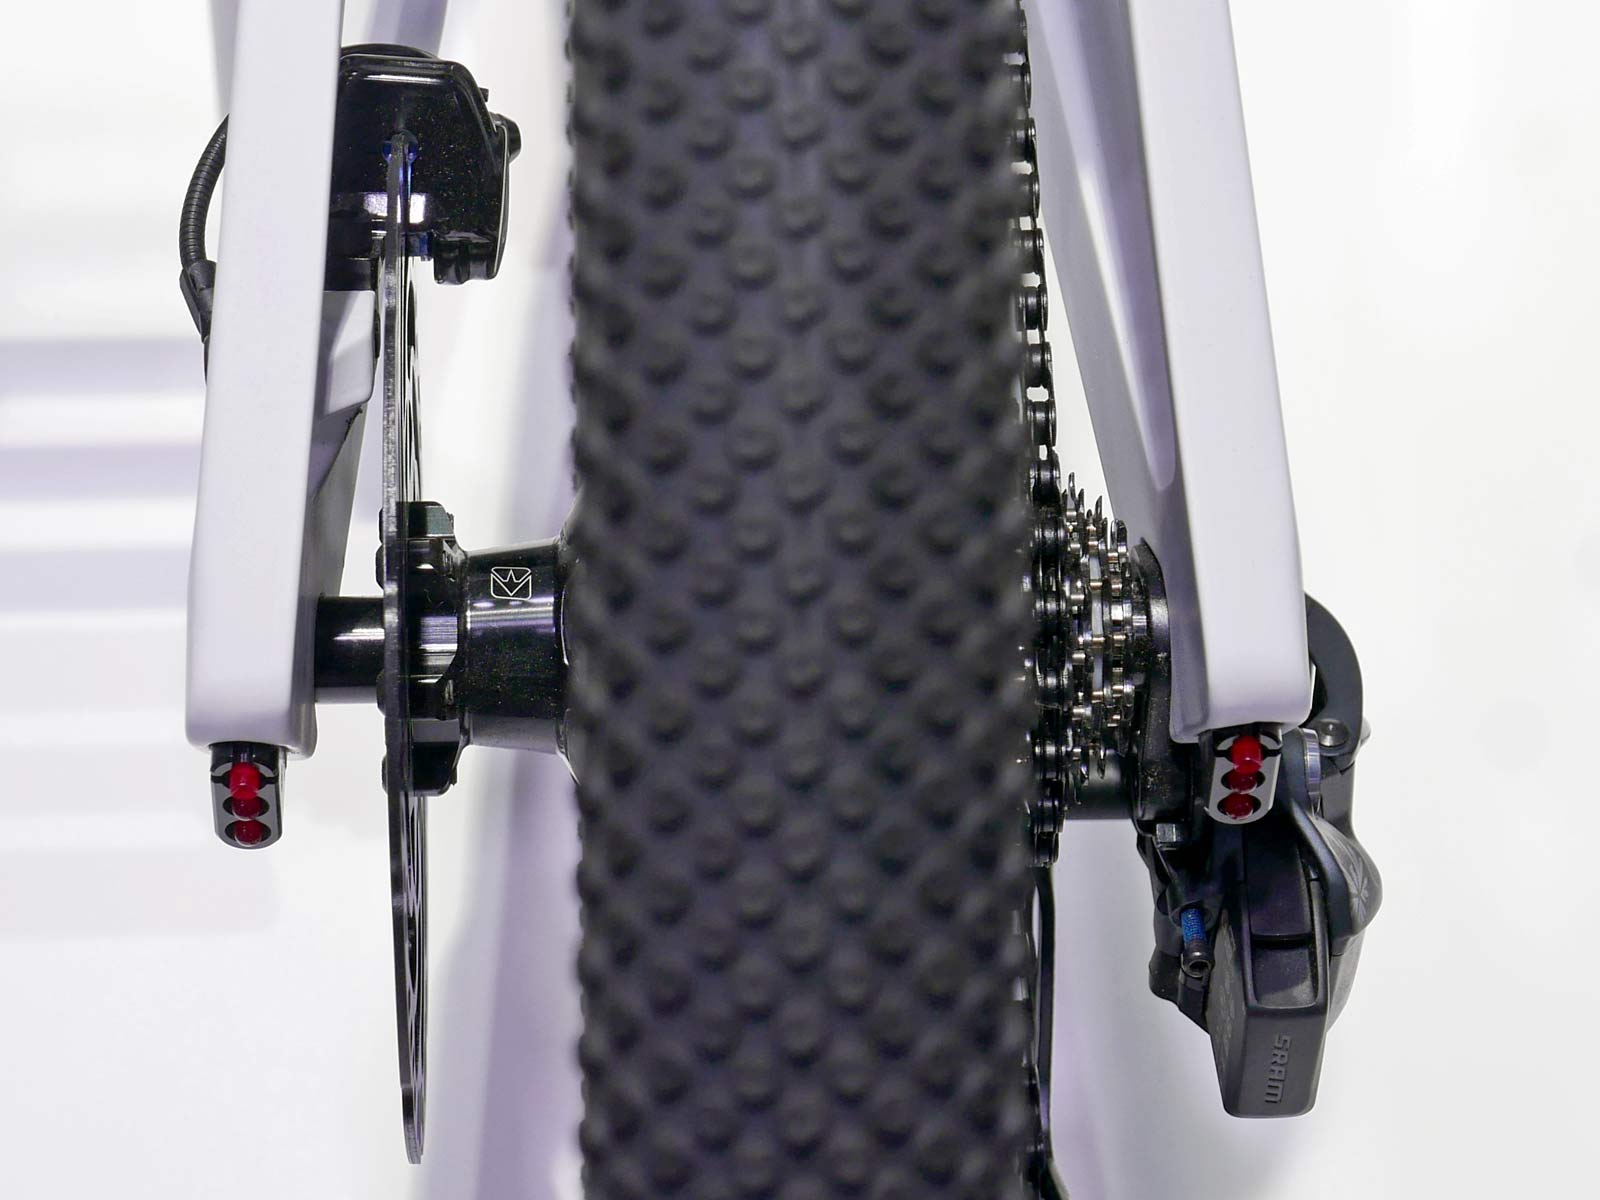 Bosch eBike ABS prototype e-bike with integrated anti-lock braking, tidy lighting